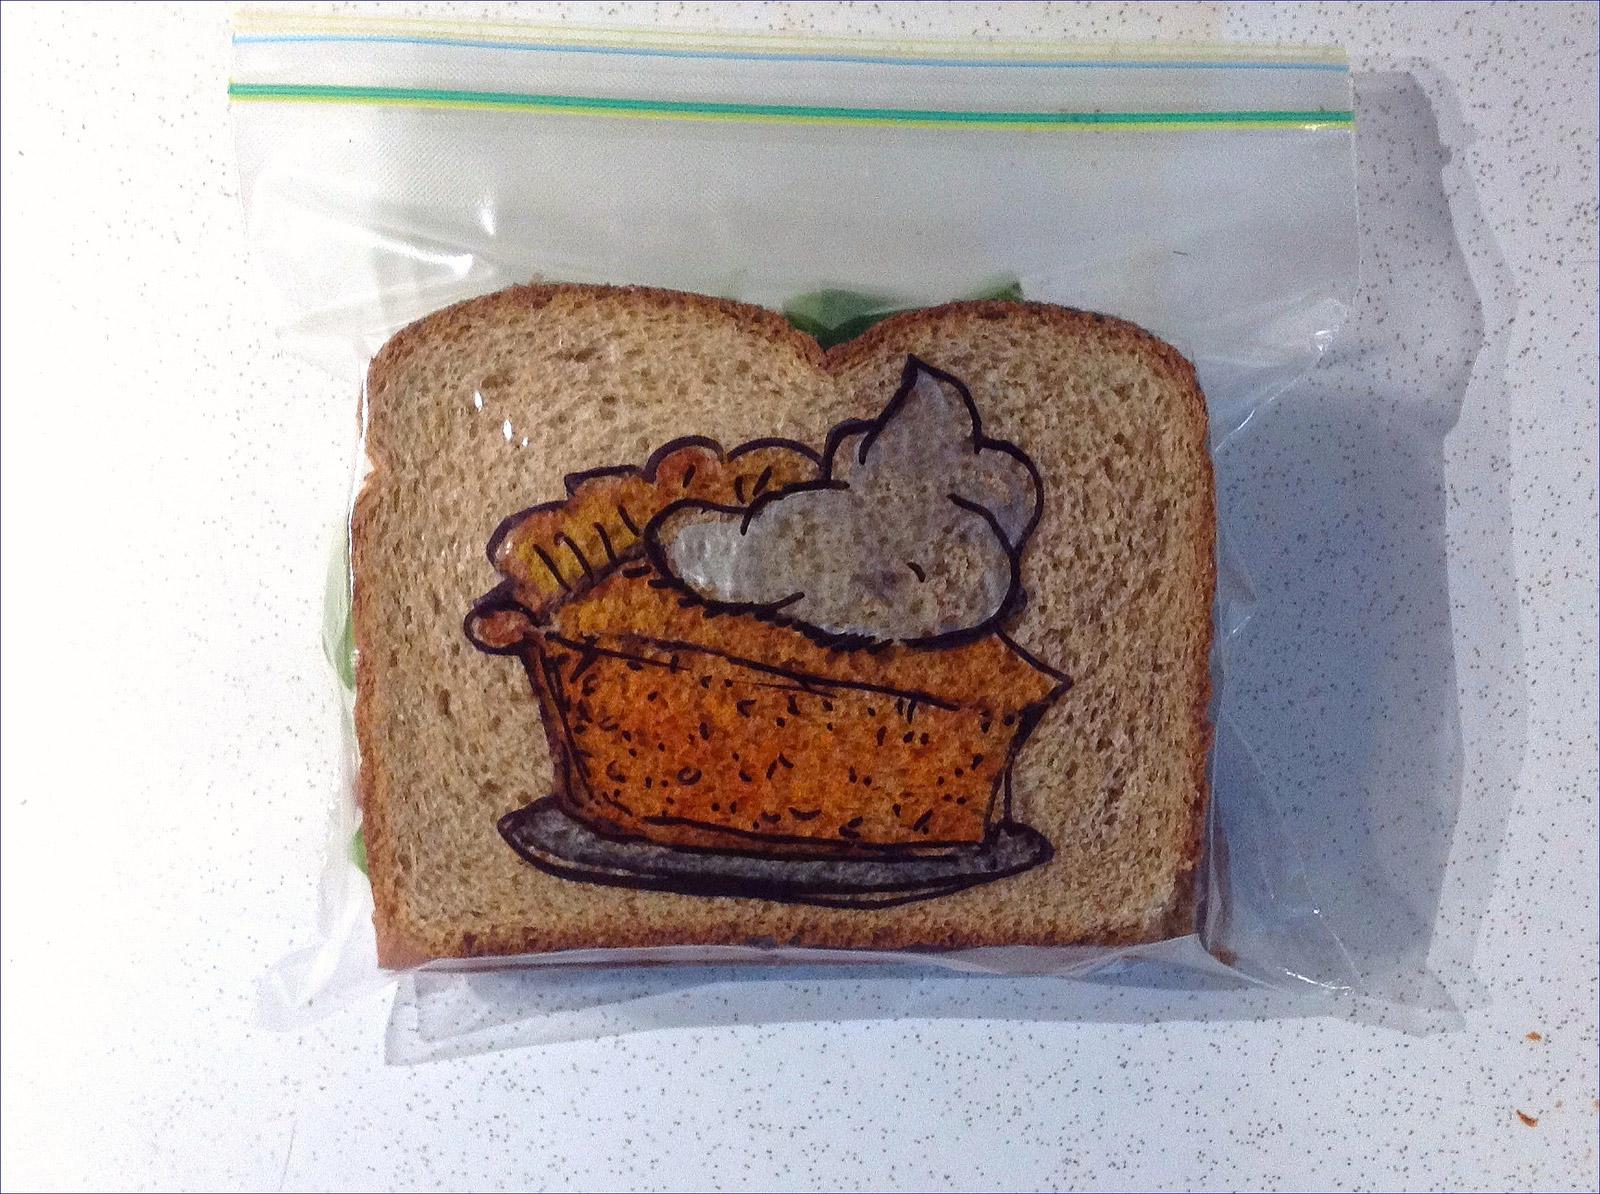 david-laferriere-creative-lunch-bag-illustration-26